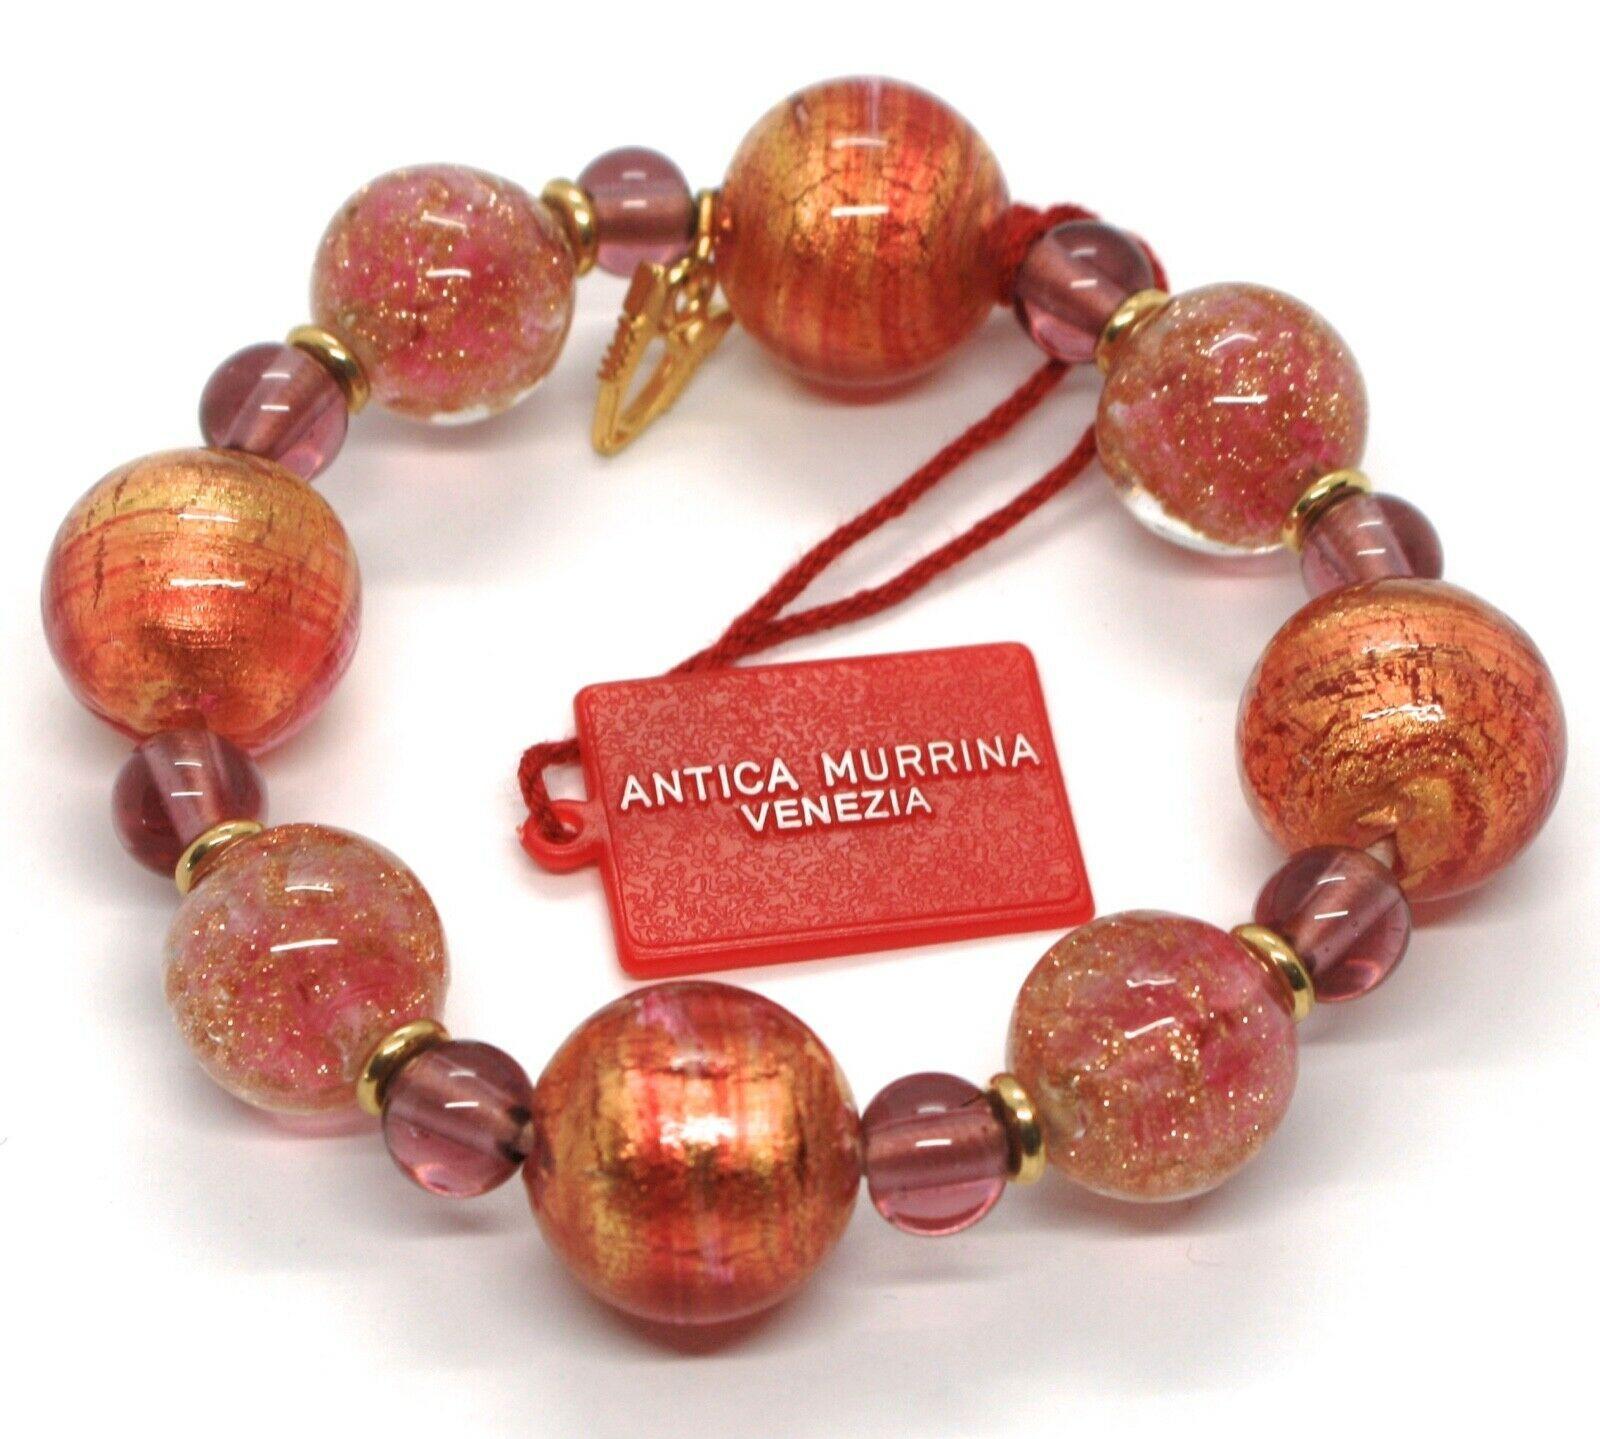 Bracelet Antica Murrina Venezia, Murano, Spheres Large, Purple Orange, Glitter